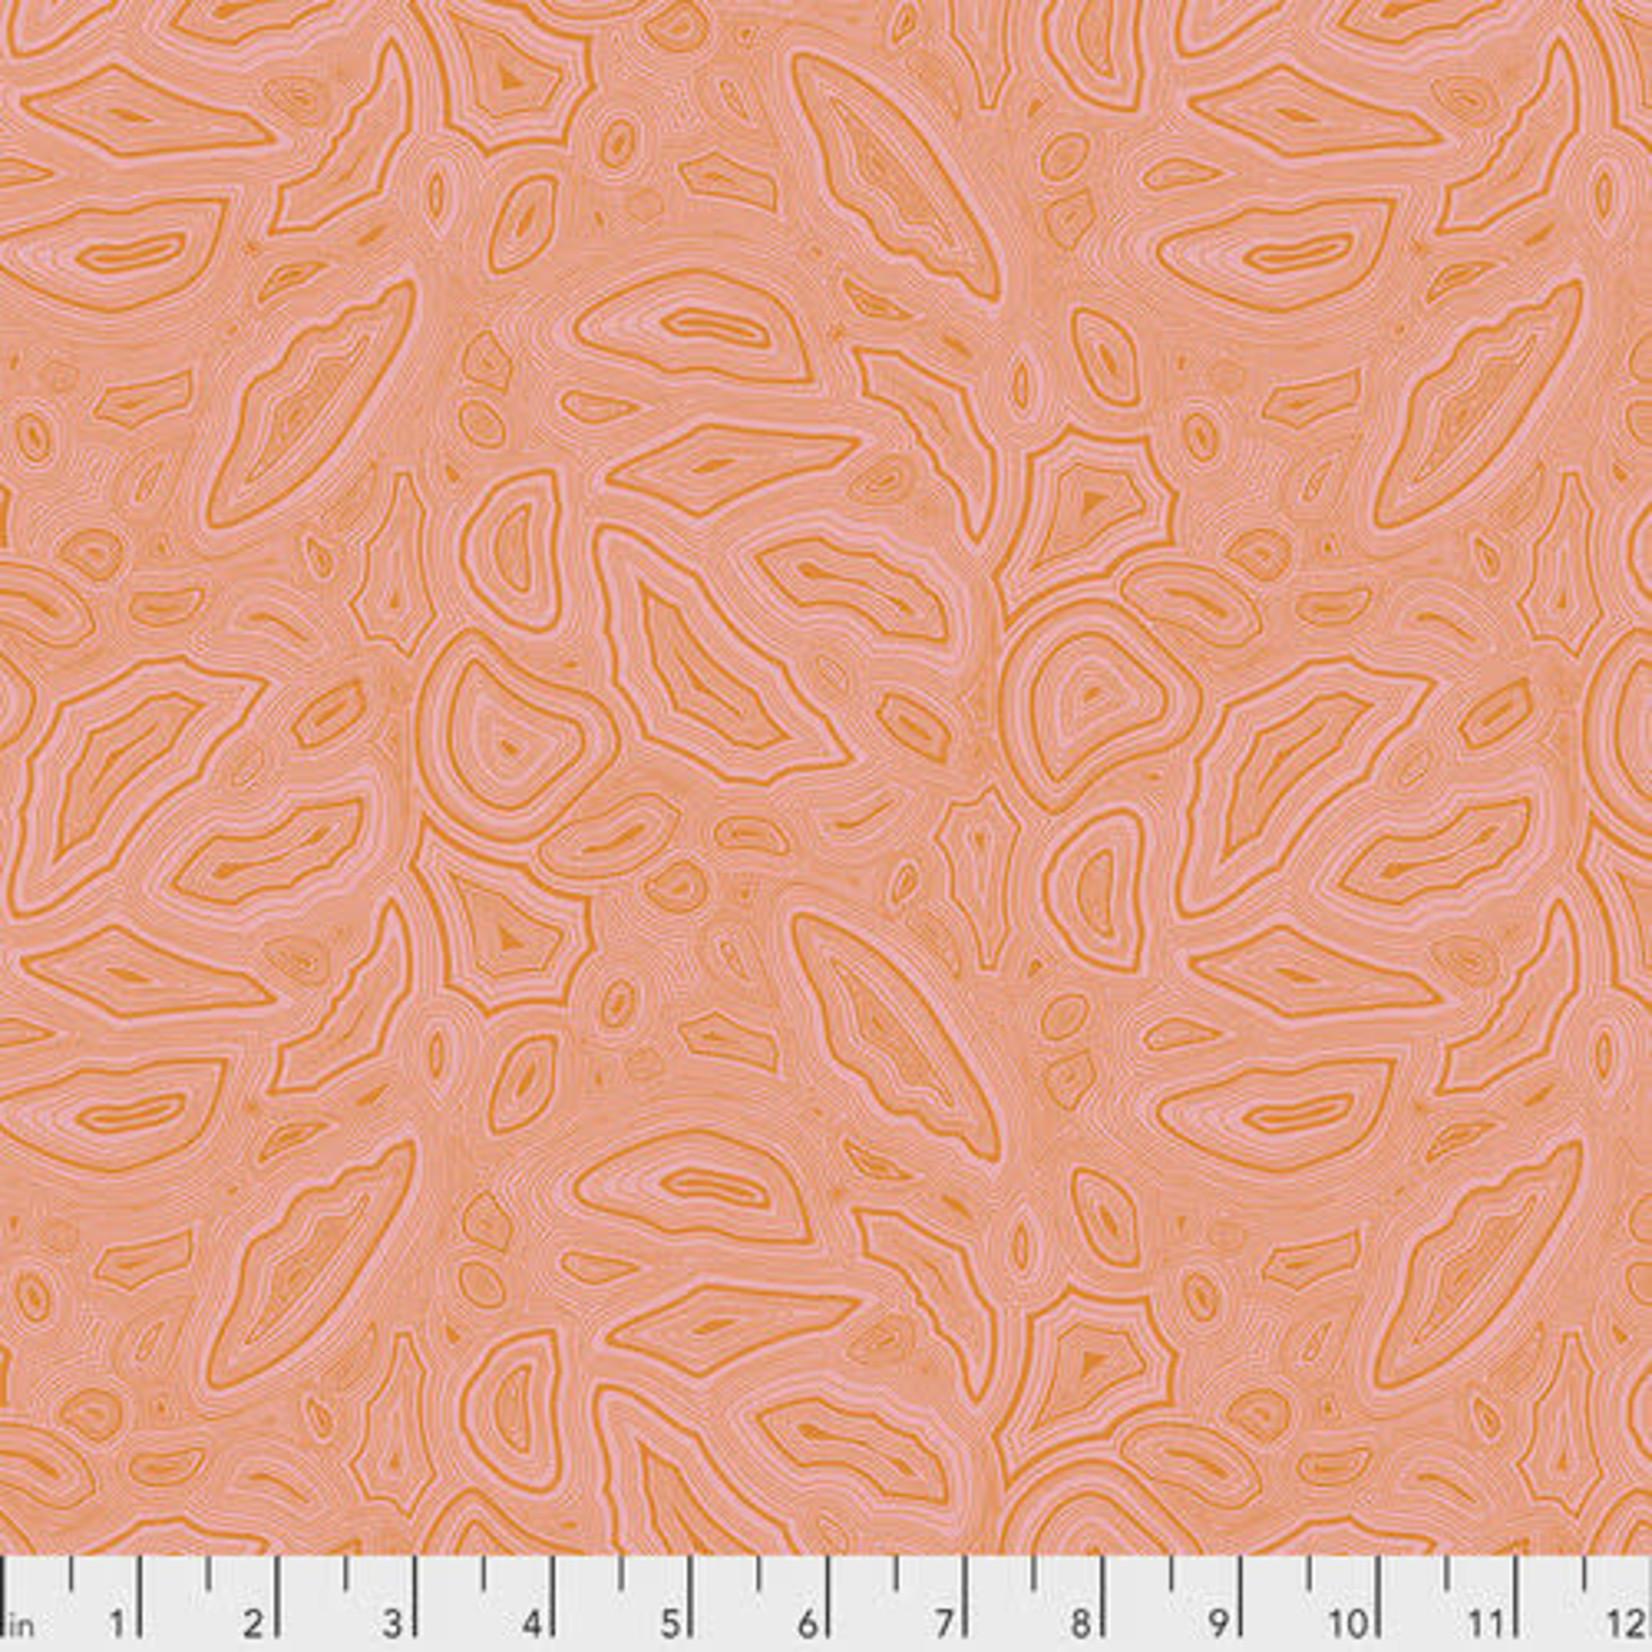 Tula Pink Tula  Mineral, Morganite $0.17per cm or $17/m